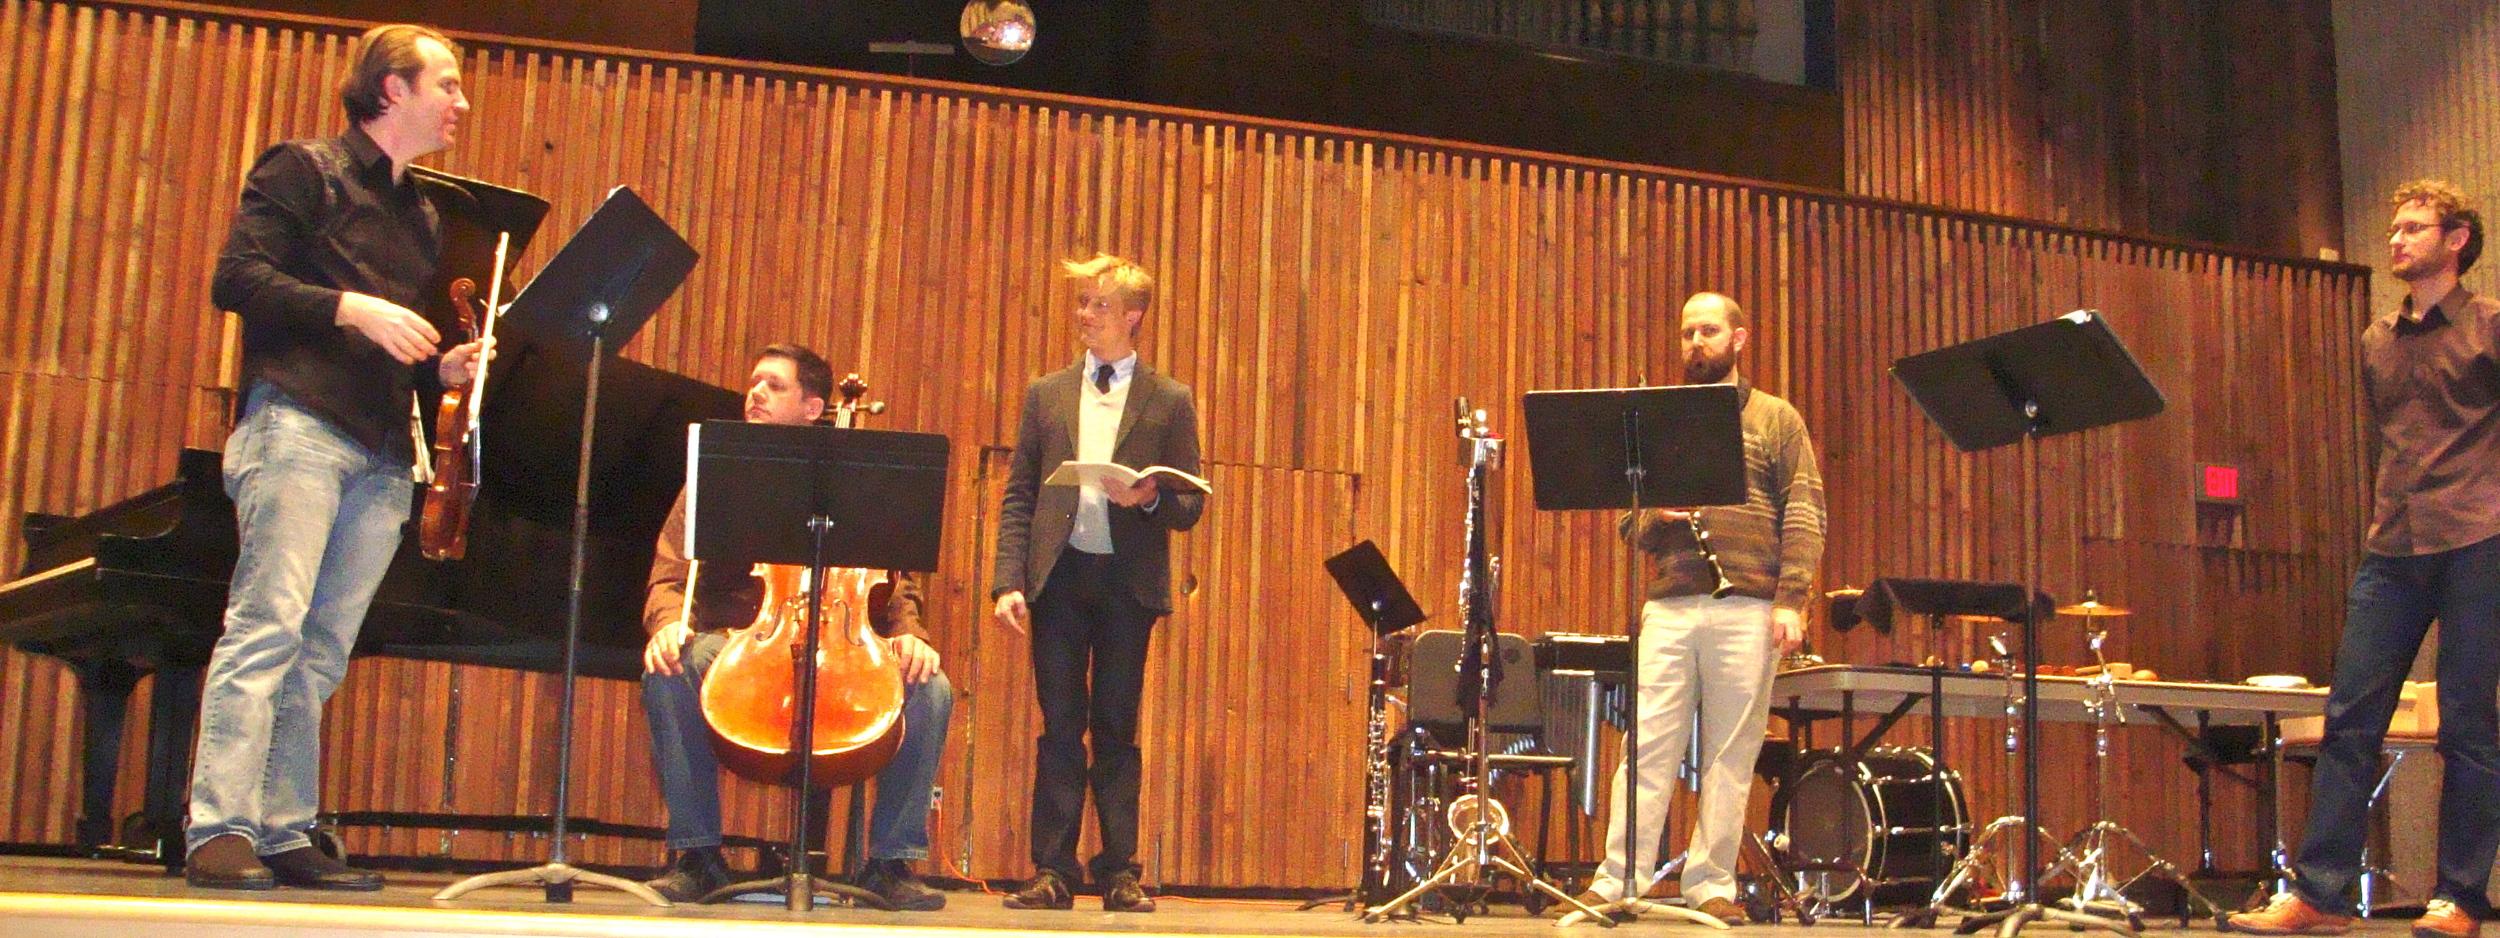 With  eighth blackbird  as guest reciter in Schoenberg's Pierrot Lunaire.